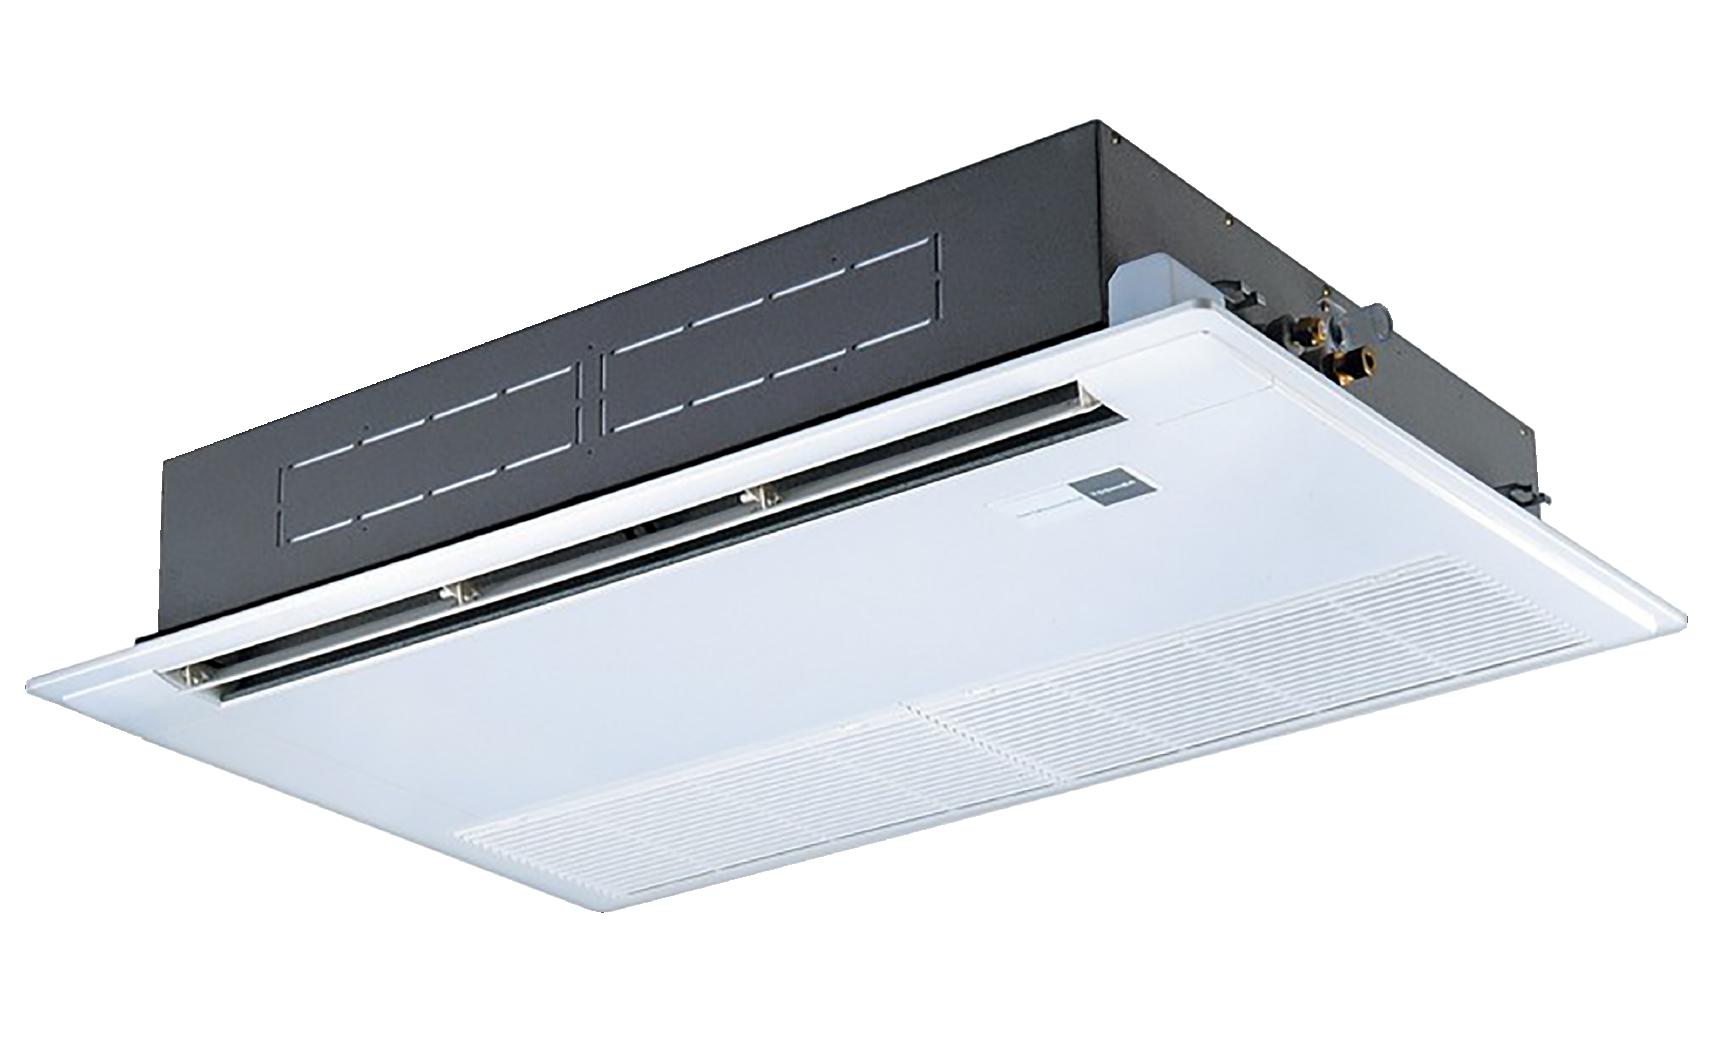 Vrf Indoor Unit 1 Way Cassette Toshiba Air Conditioning